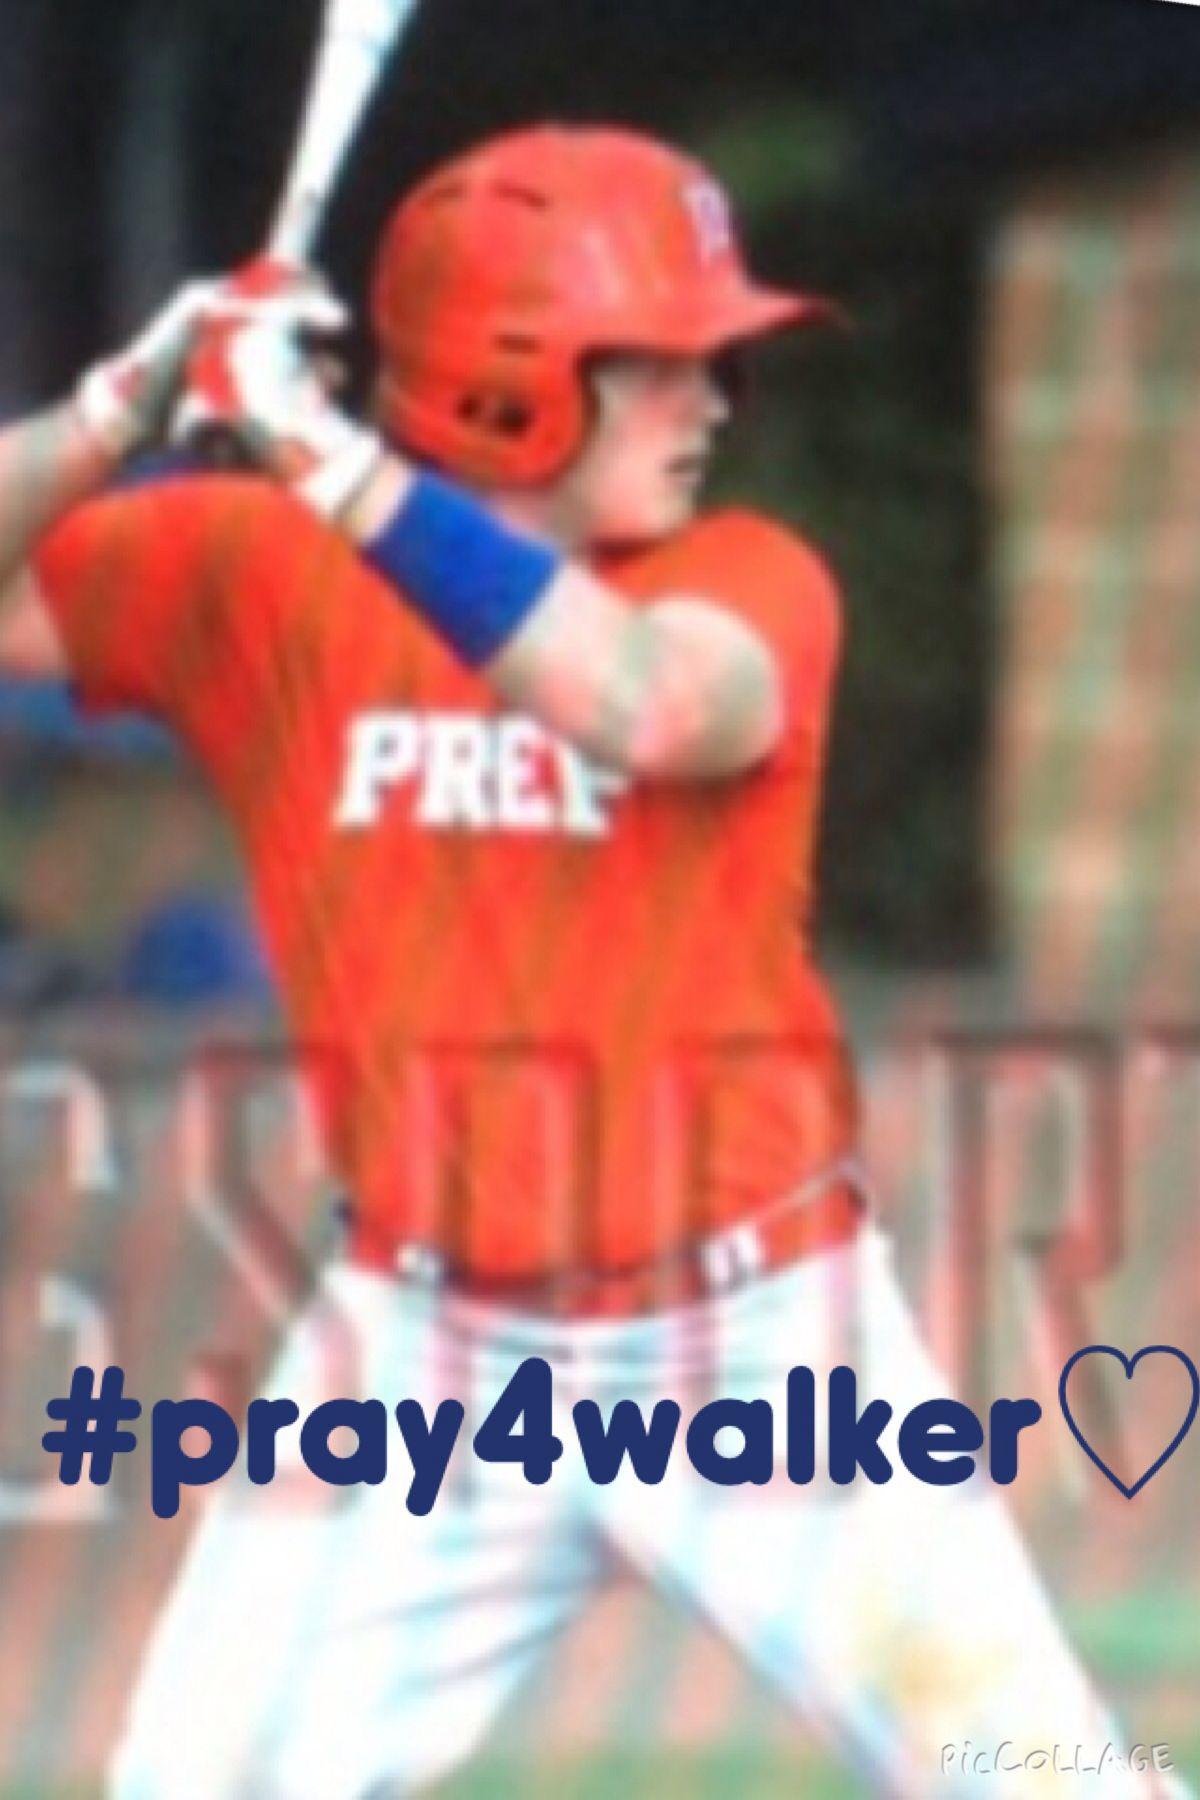 PLEASE PLEASE PLEASE HE NEEDS ALOT OF PRAYERS♡